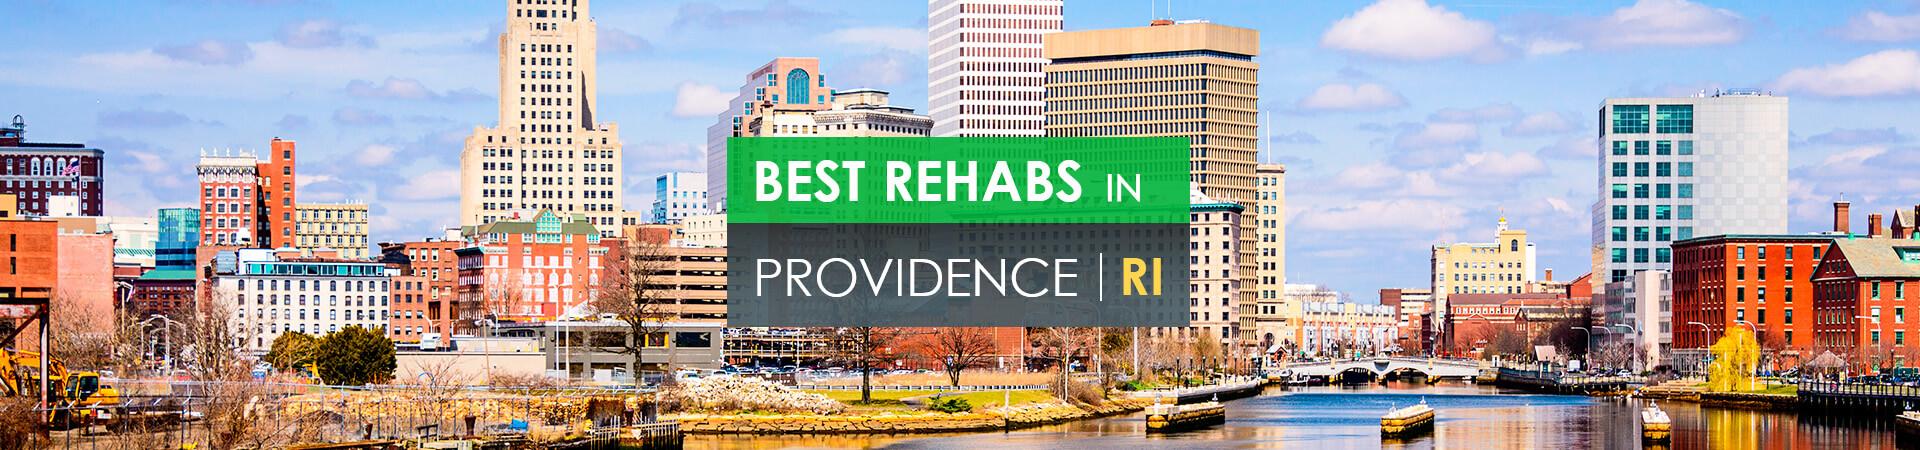 Best rehabs in Providence, RI